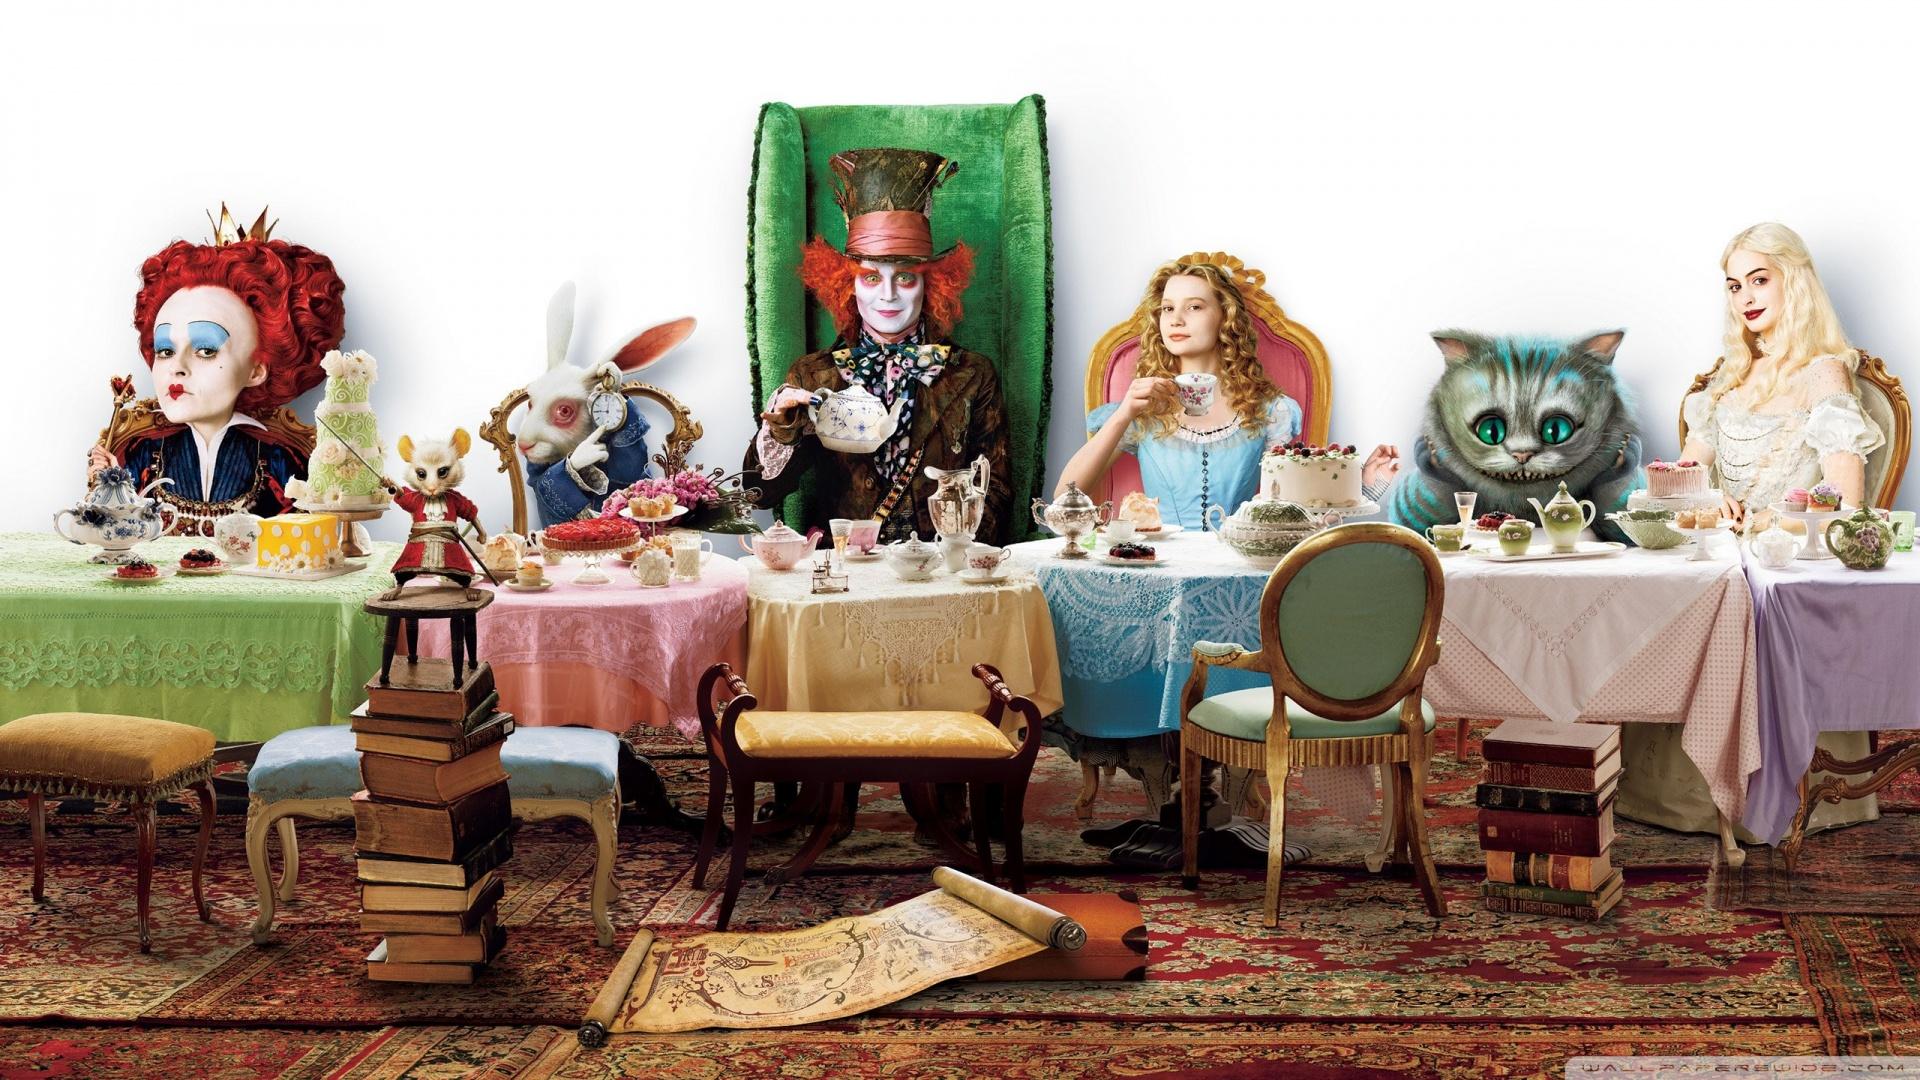 tea party wallpaper wallpapersafari. Black Bedroom Furniture Sets. Home Design Ideas